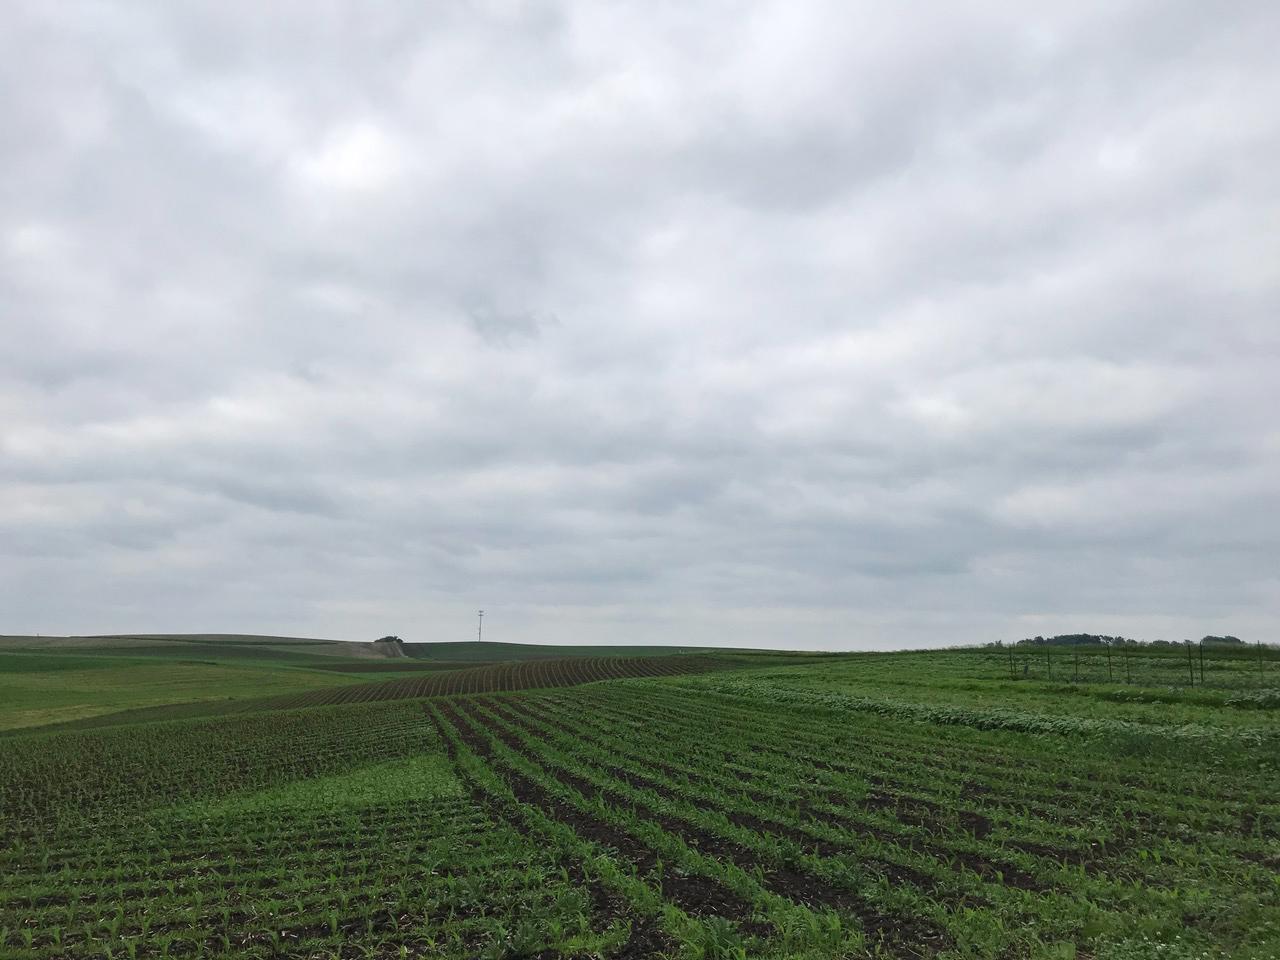 farm_country_01.jpg